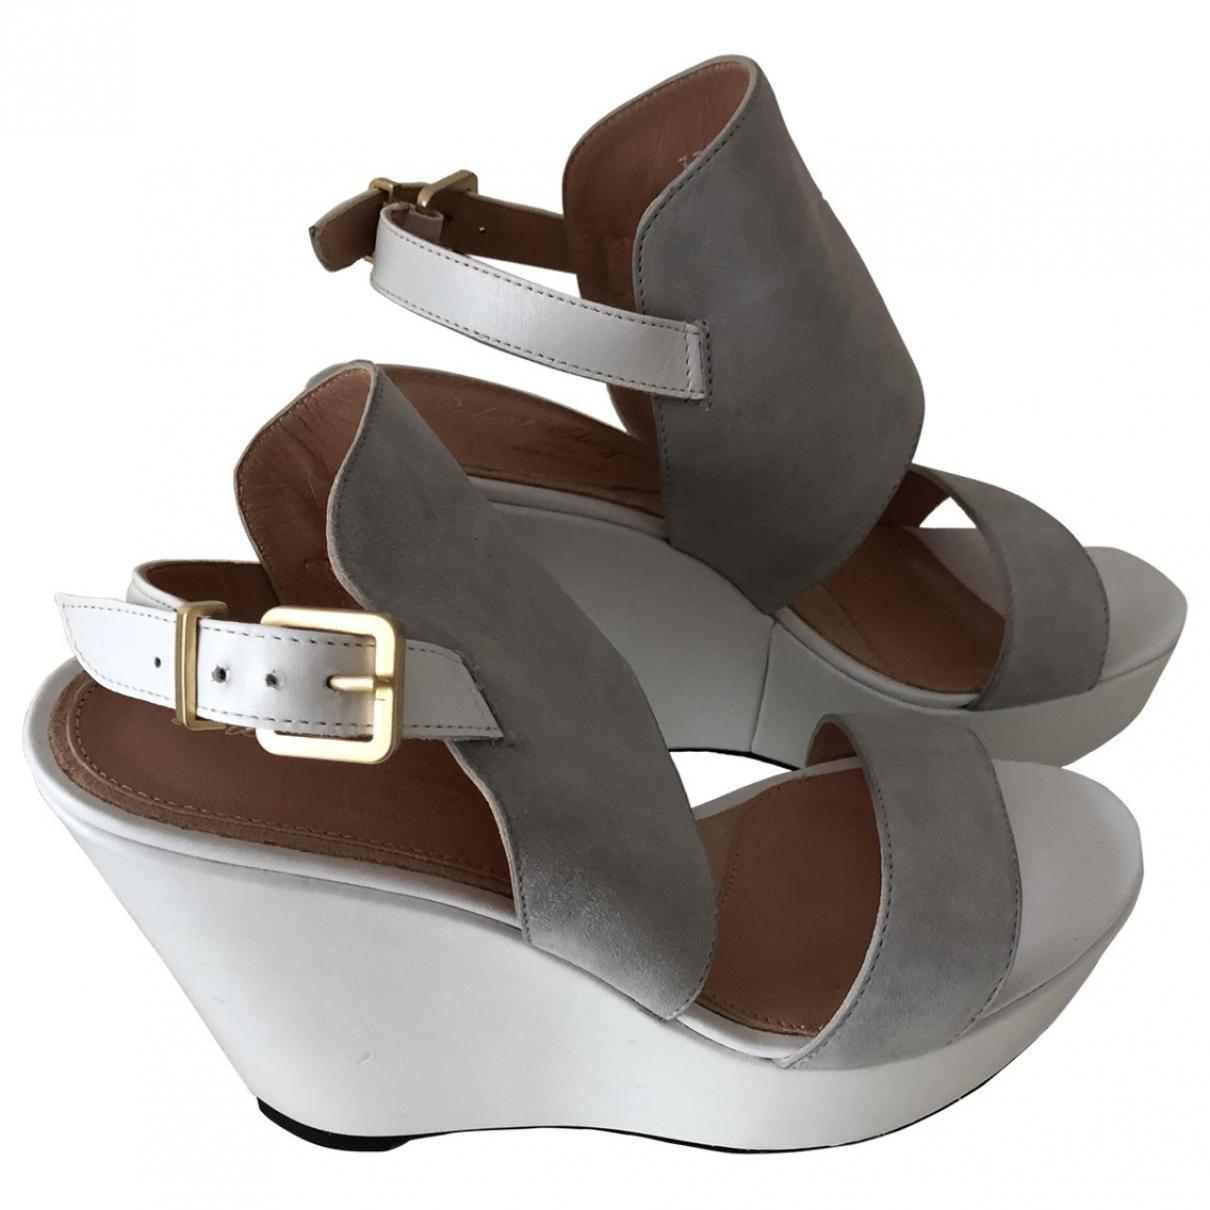 Robert Clergerie \N Grey Suede Sandals for Women 37.5 EU